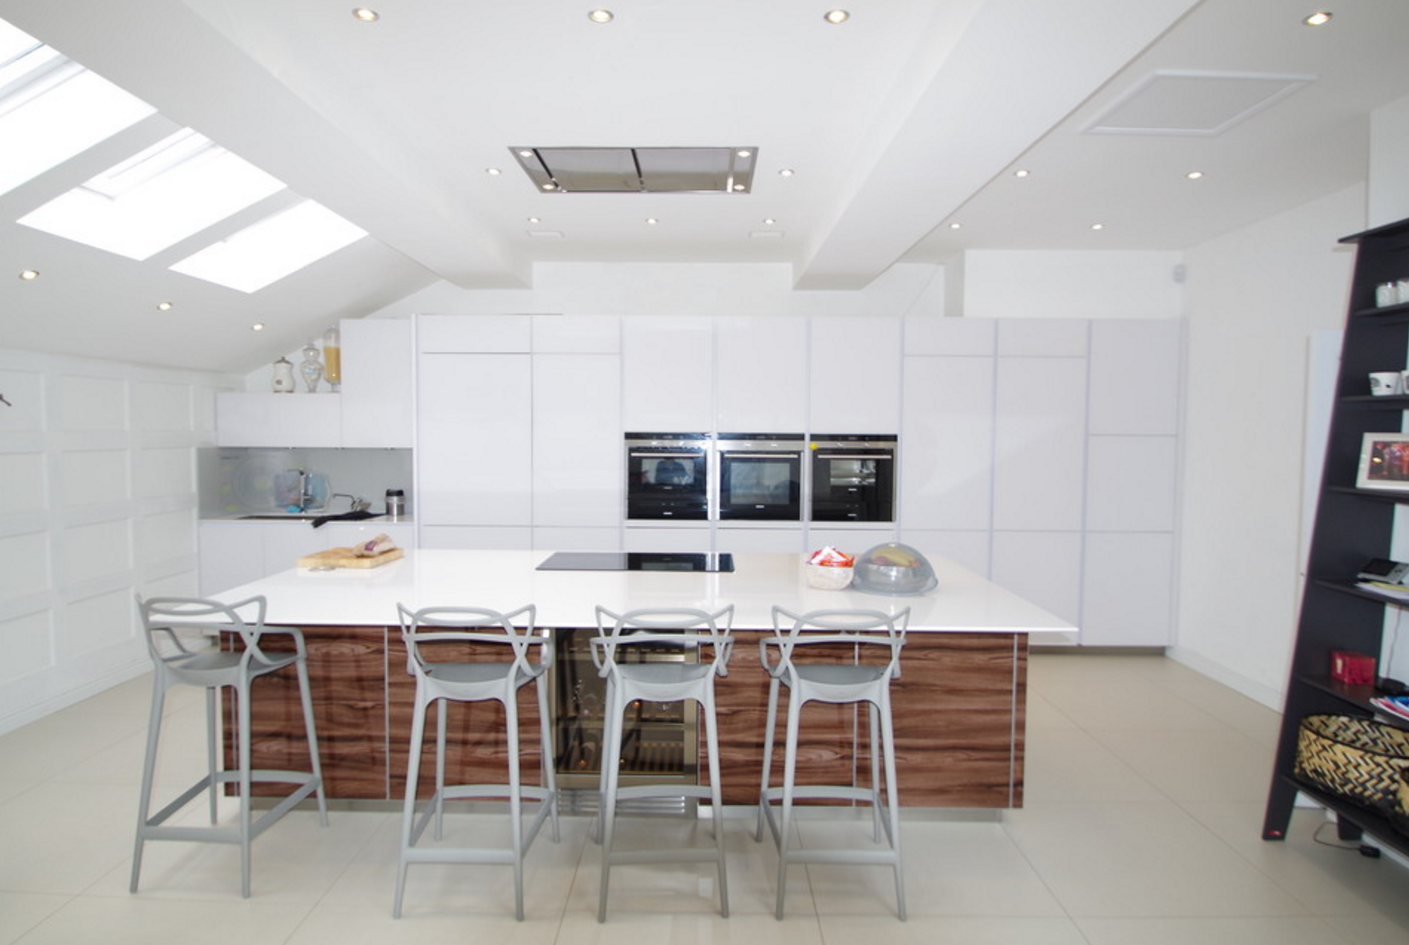 Masters Stoolsphilippe Starck For Kartella Designer Kitchen Interesting Designer Kitchen Decorating Design